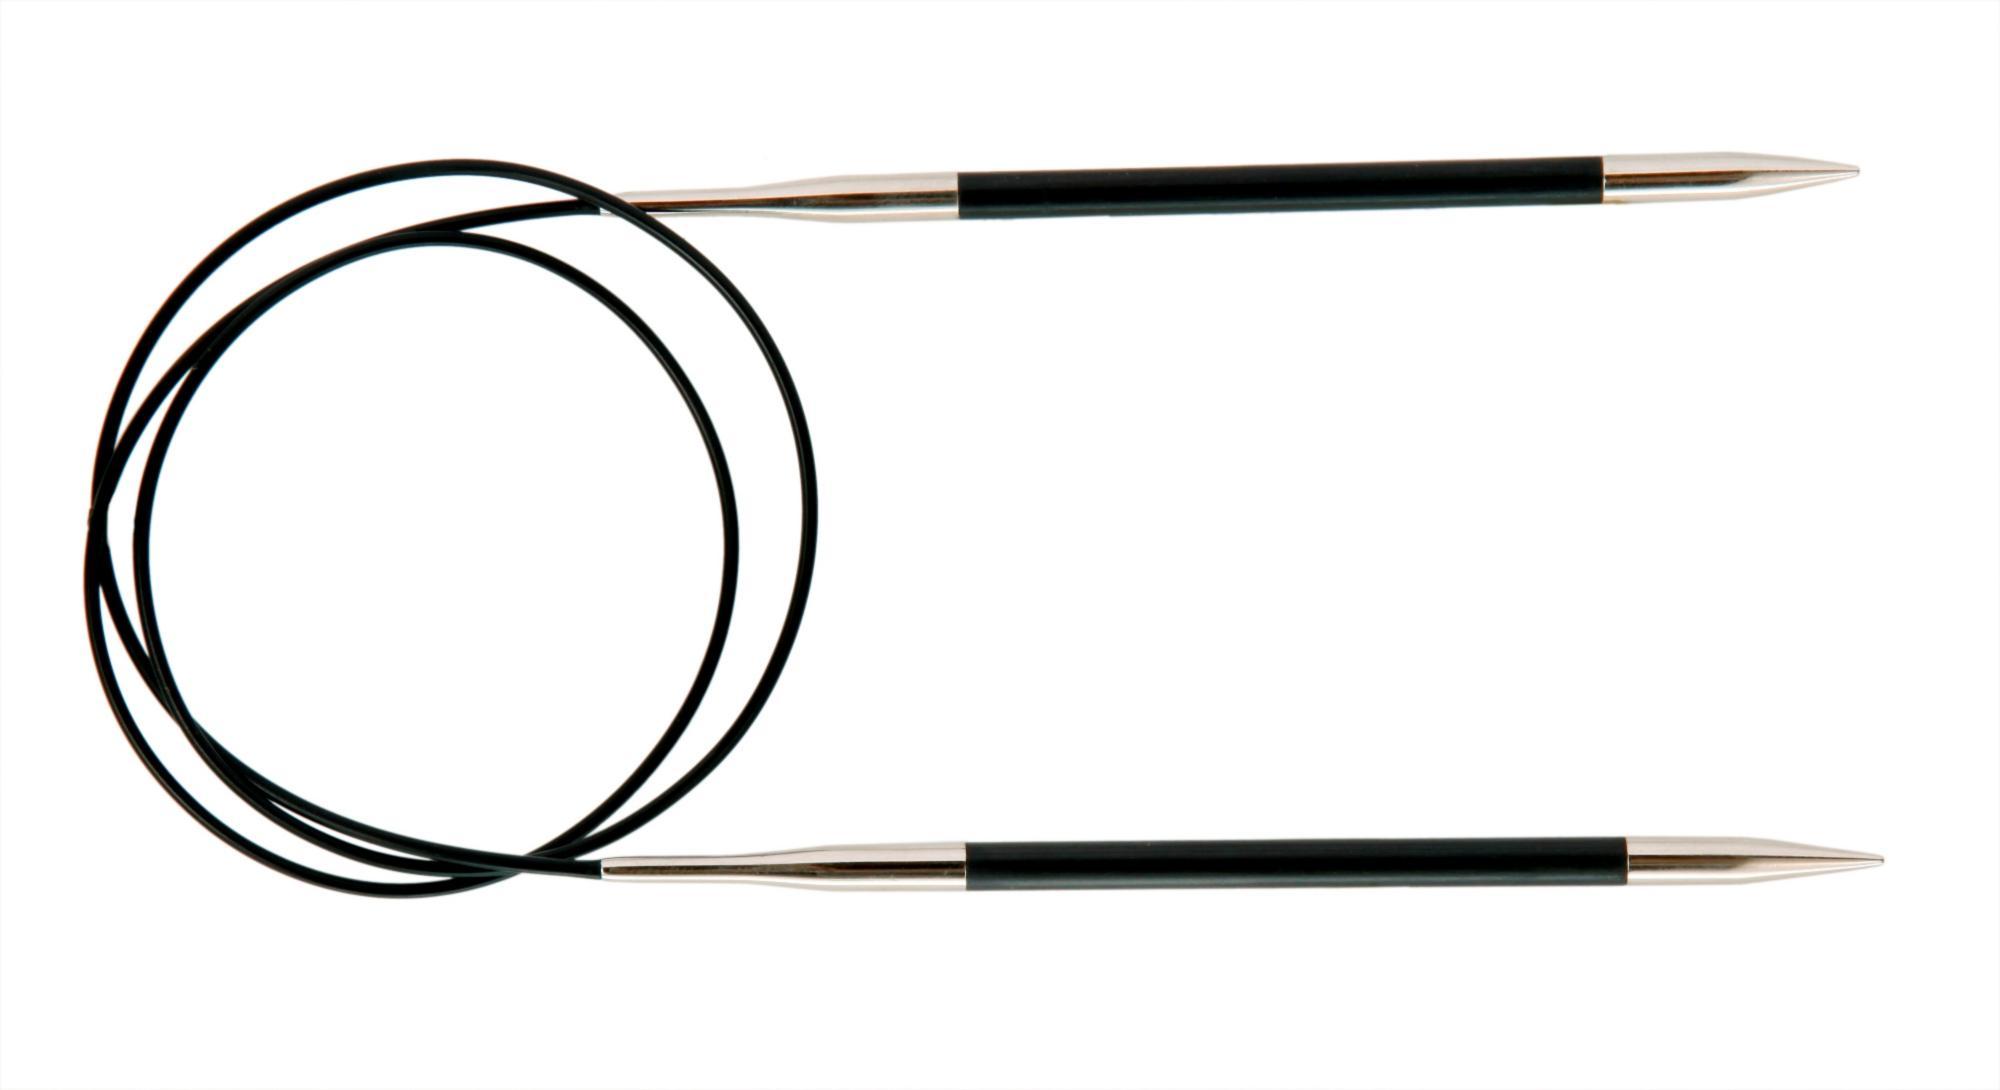 Спицы круговые 60 см Karbonz KnitPro, 41165, 3.25 мм